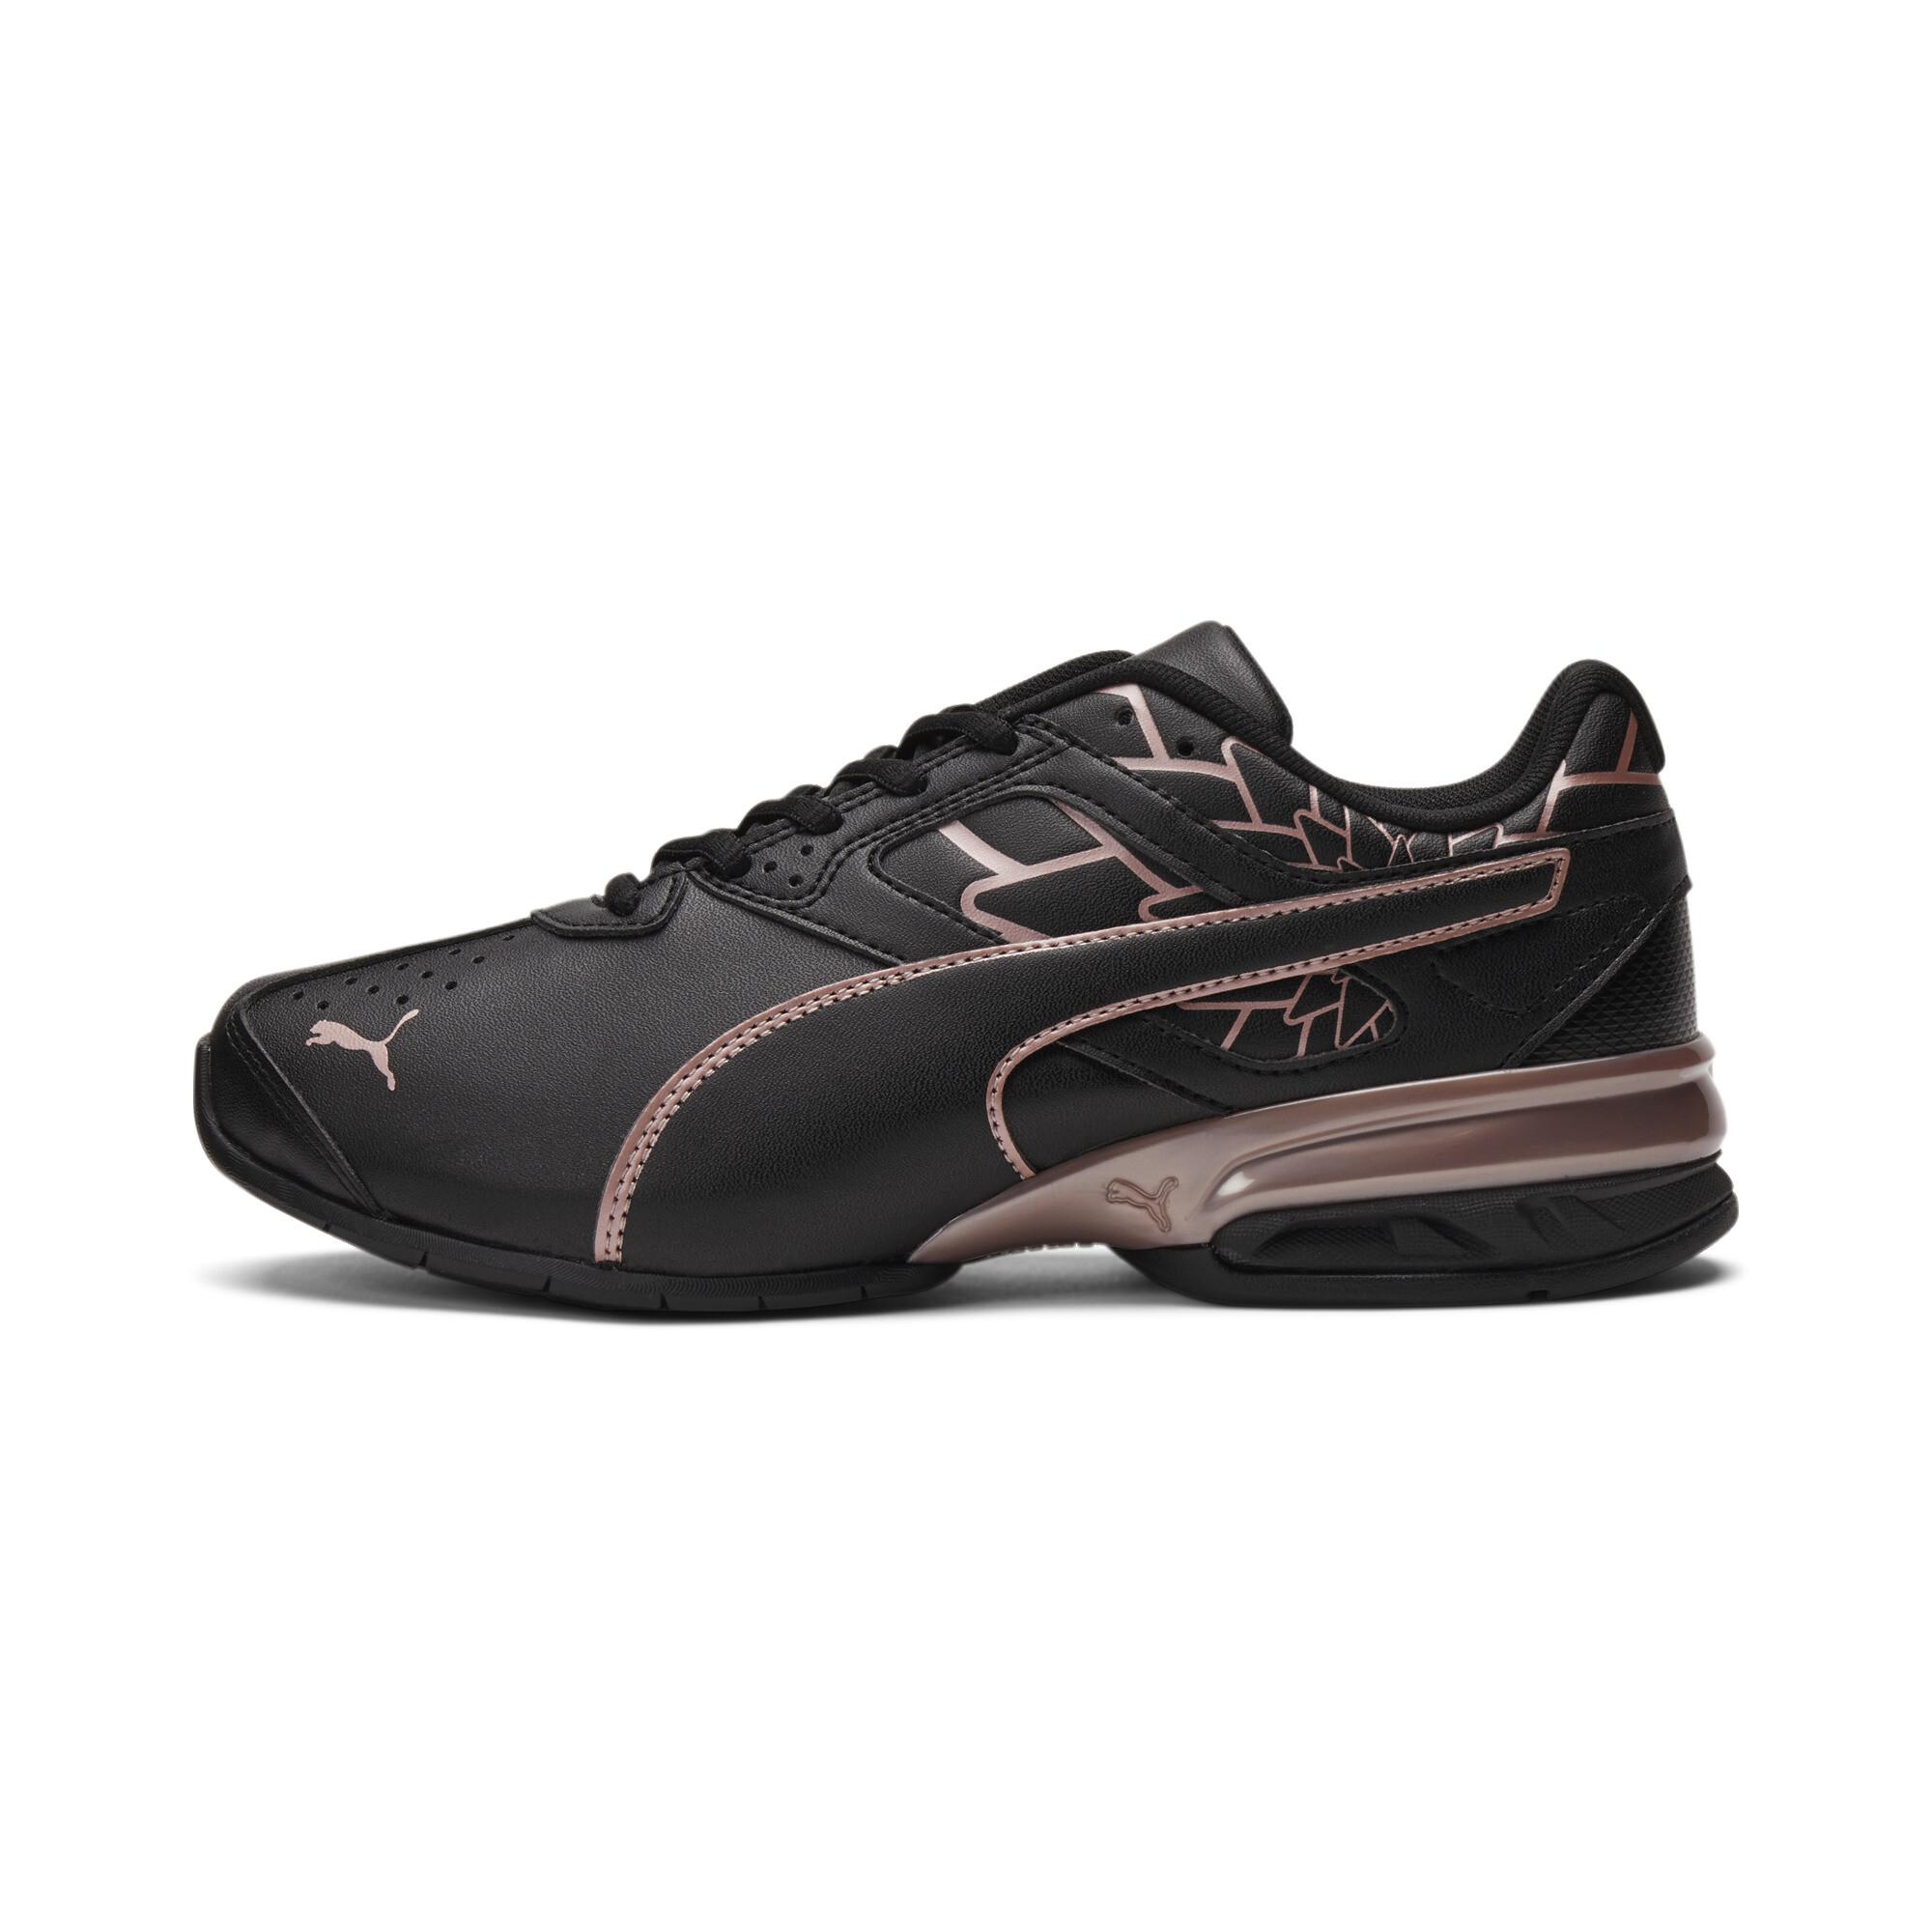 thumbnail 15 - PUMA Women's Tazon 6 Graphic Sneakers